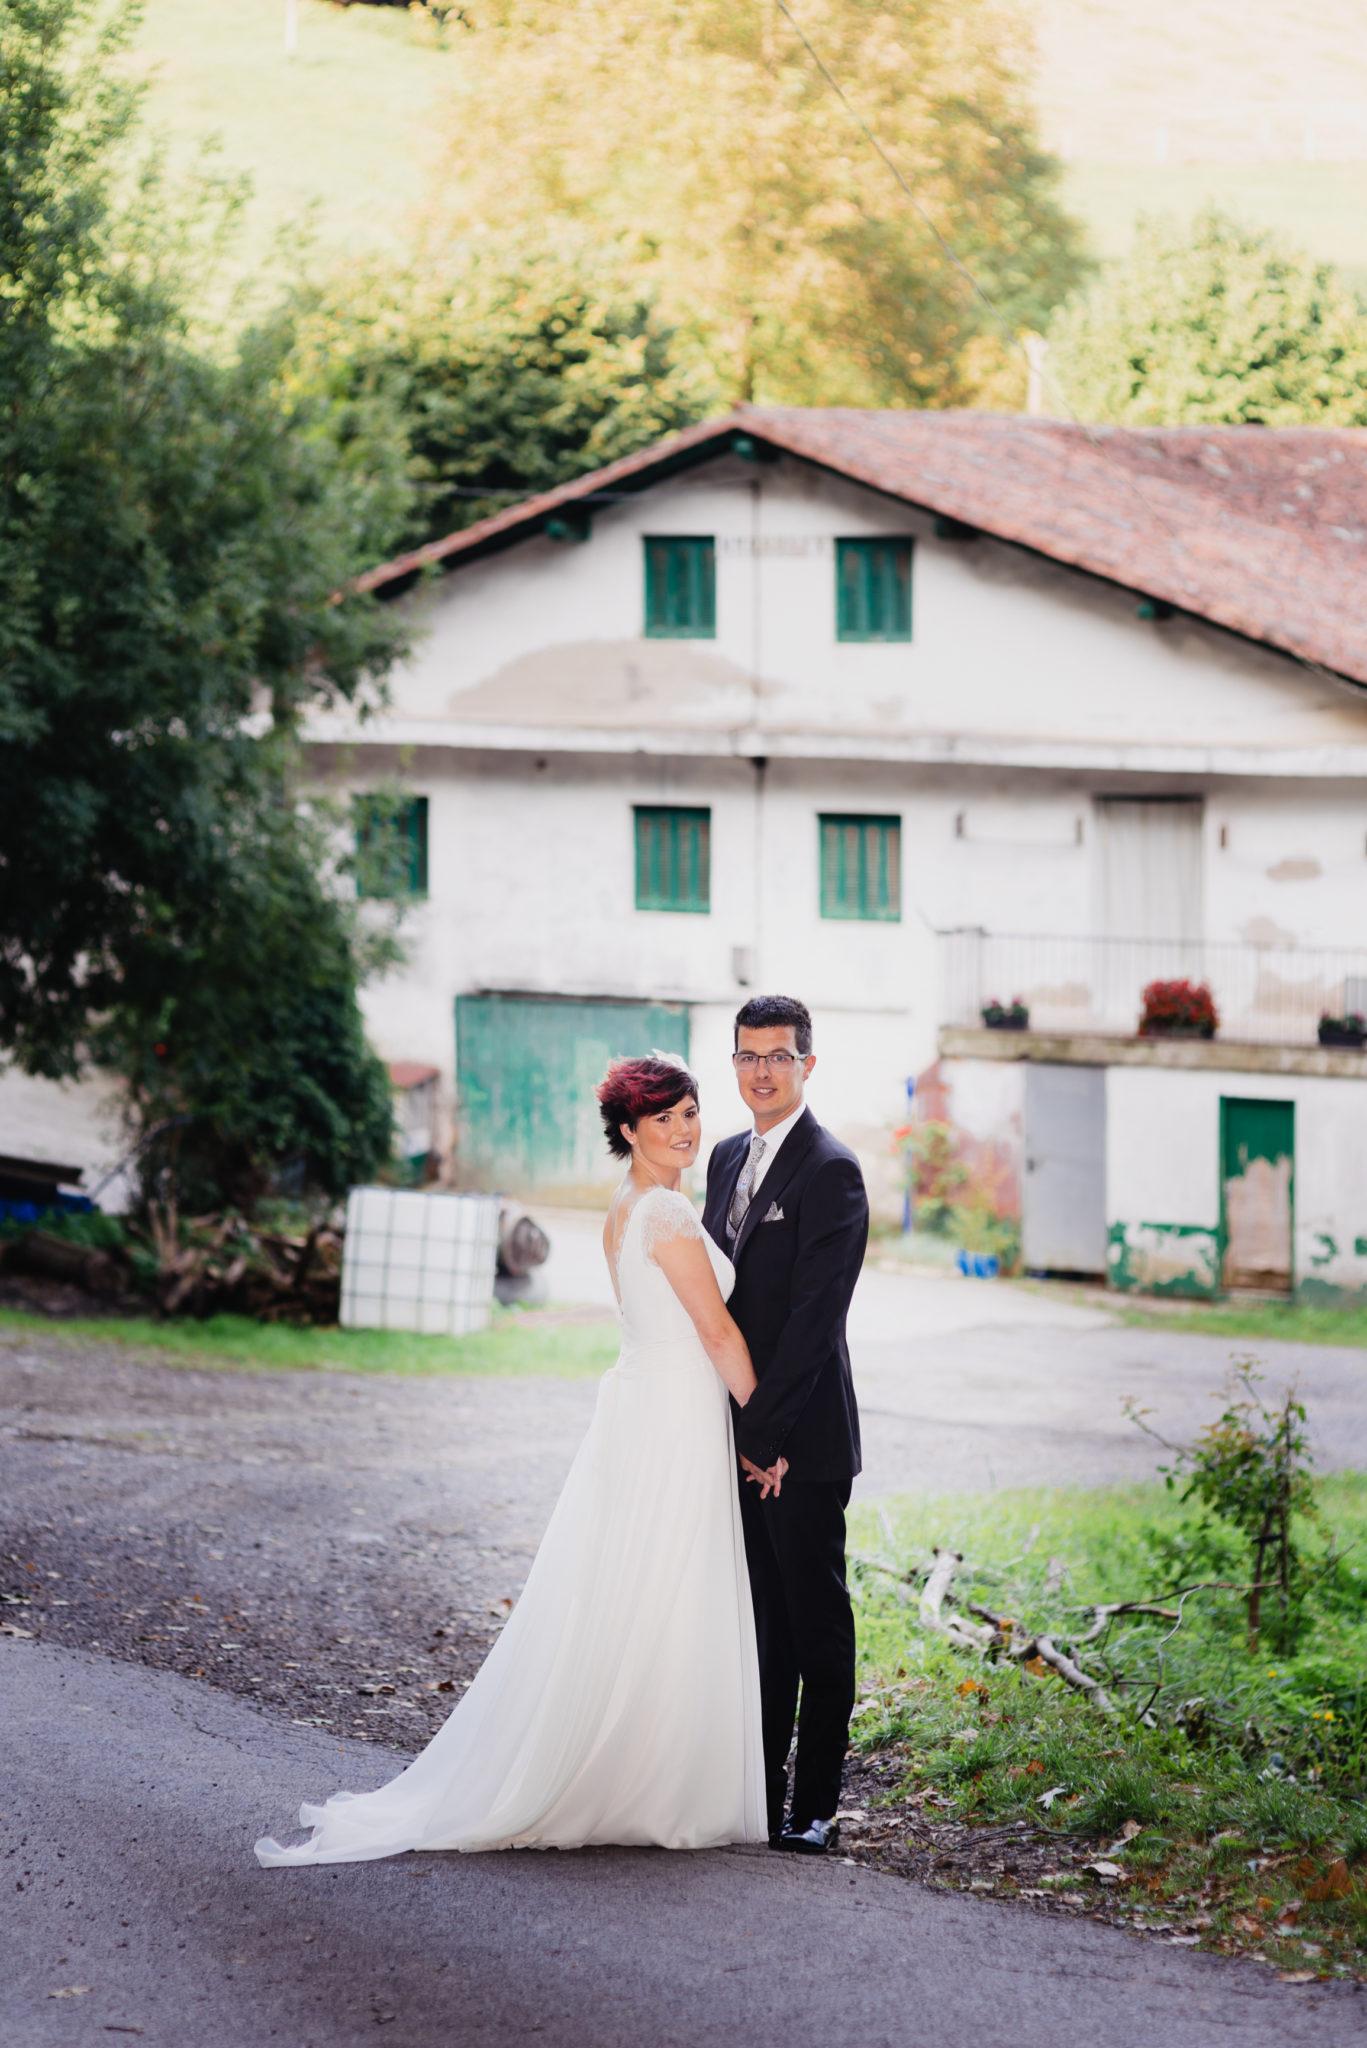 sesion-fotos-parejas-bodas-fotografo-reportaje-donosti-gipuzkoa-san-sebastian-meagas-aizarnazabal